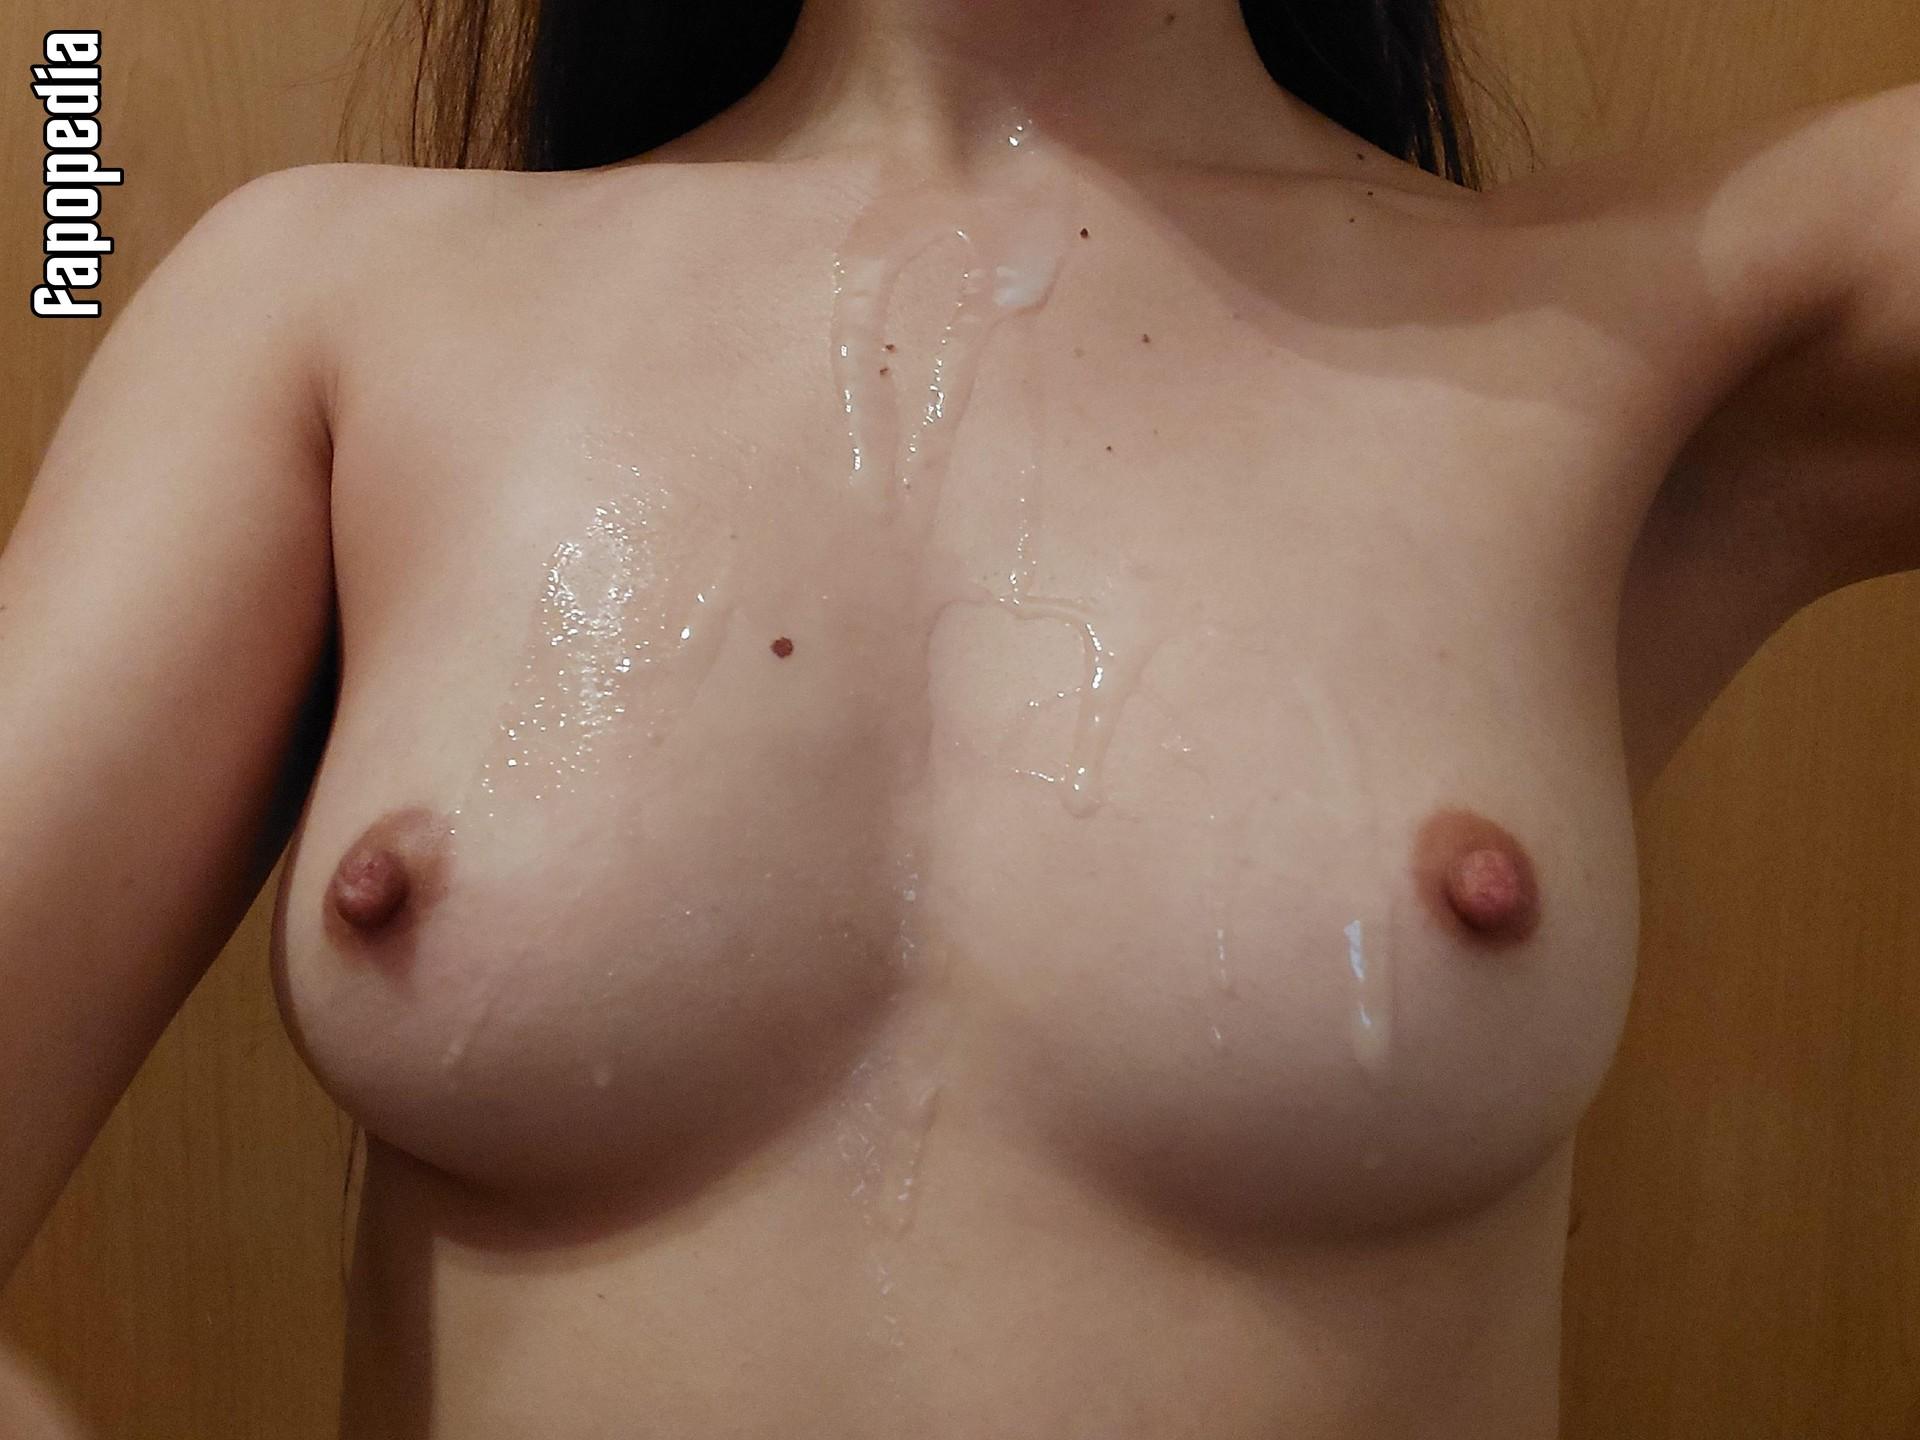 Thetiniestbunny Nude Leaks